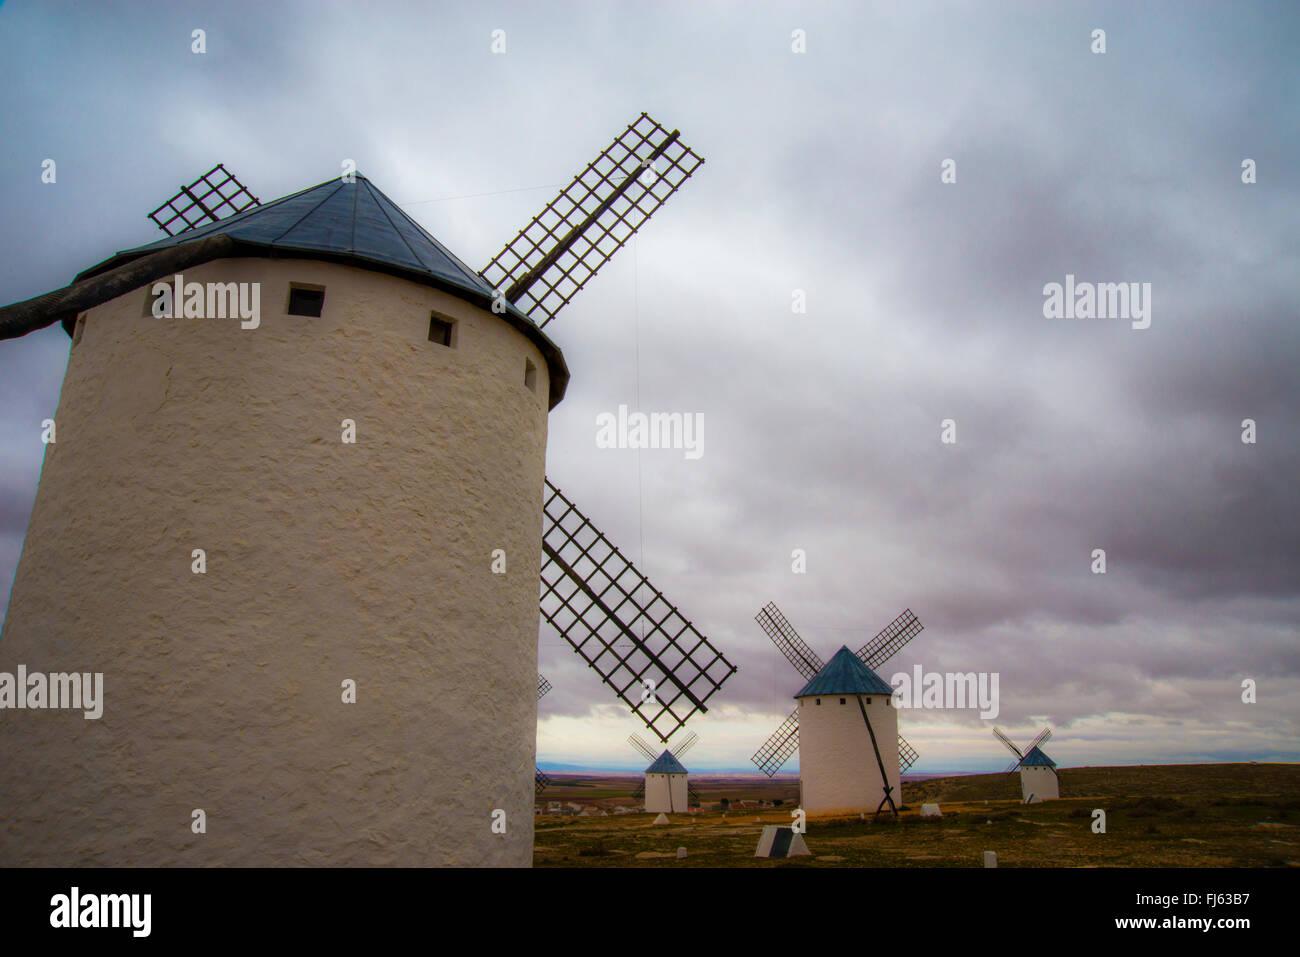 Windmills and cloudy sky. Campo de Criptana, Ciudad Real province, Castilla La Mancha, Spain. - Stock Image